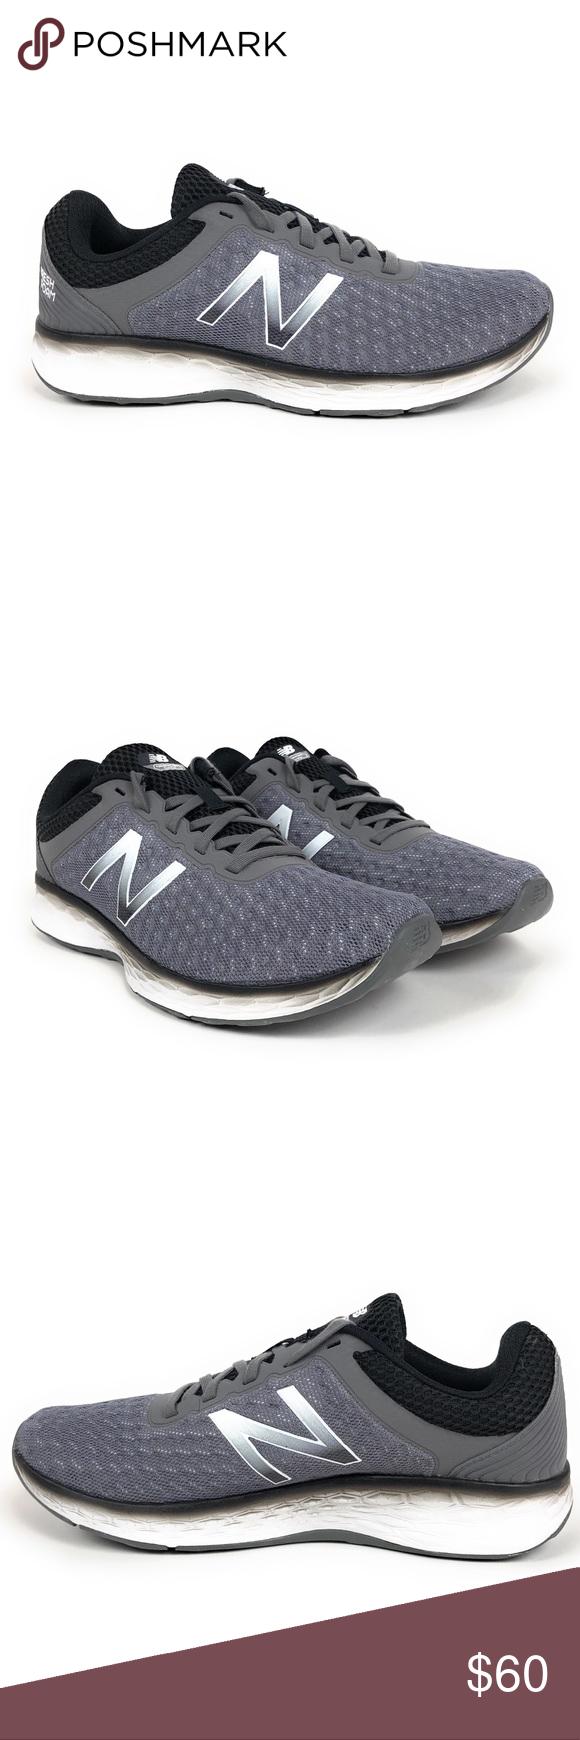 New Balance Fresh Foam Kaymin Shoes 4E